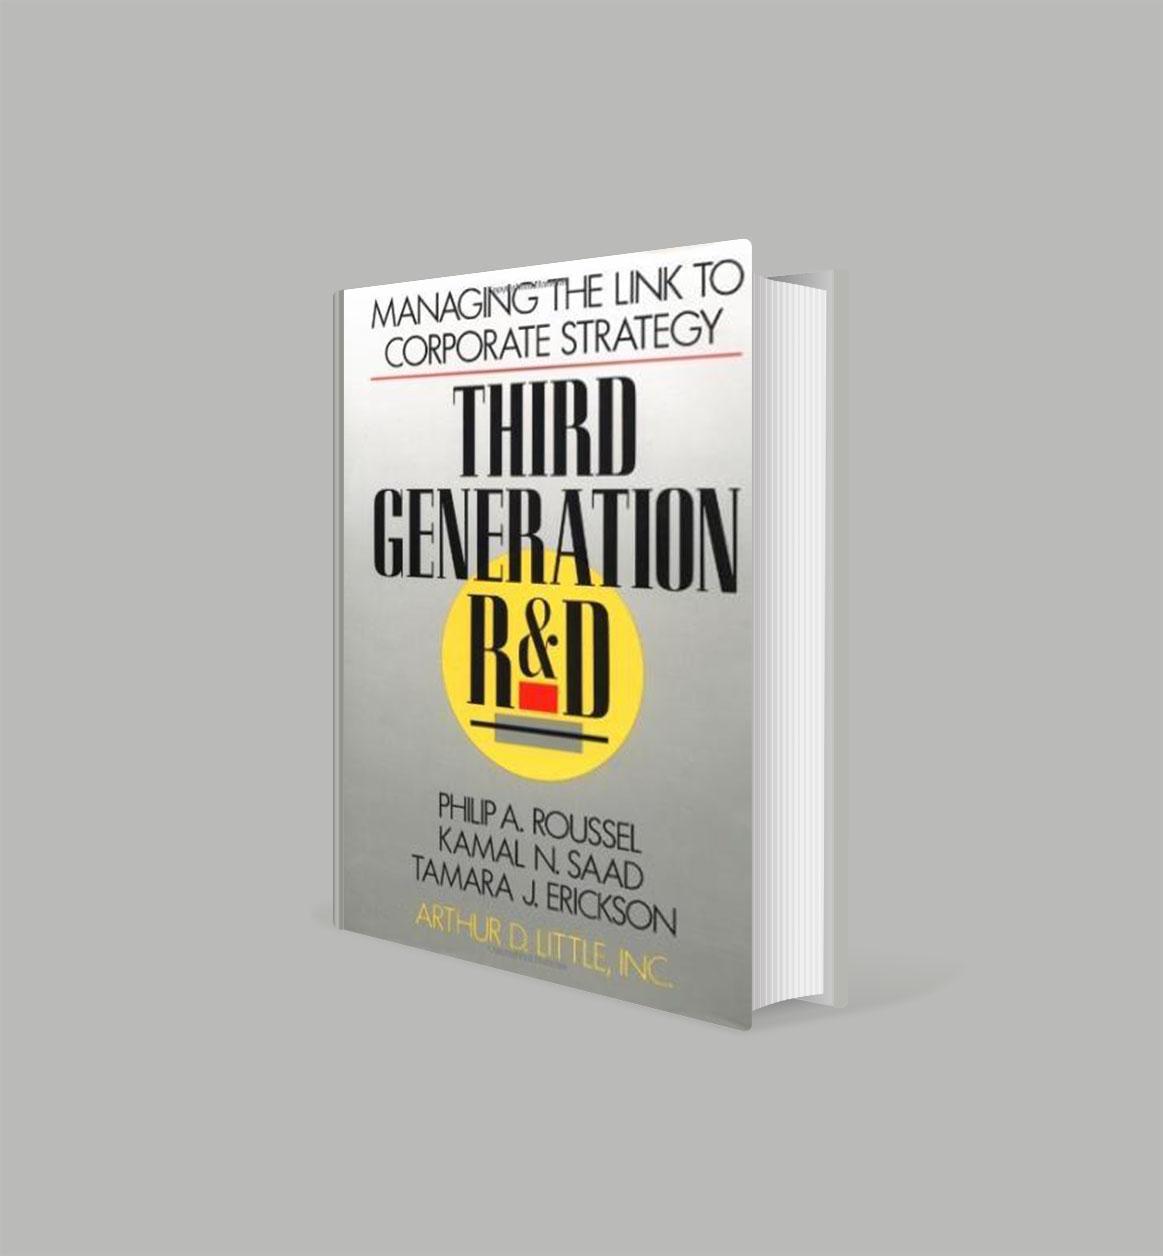 Third Generation R&D